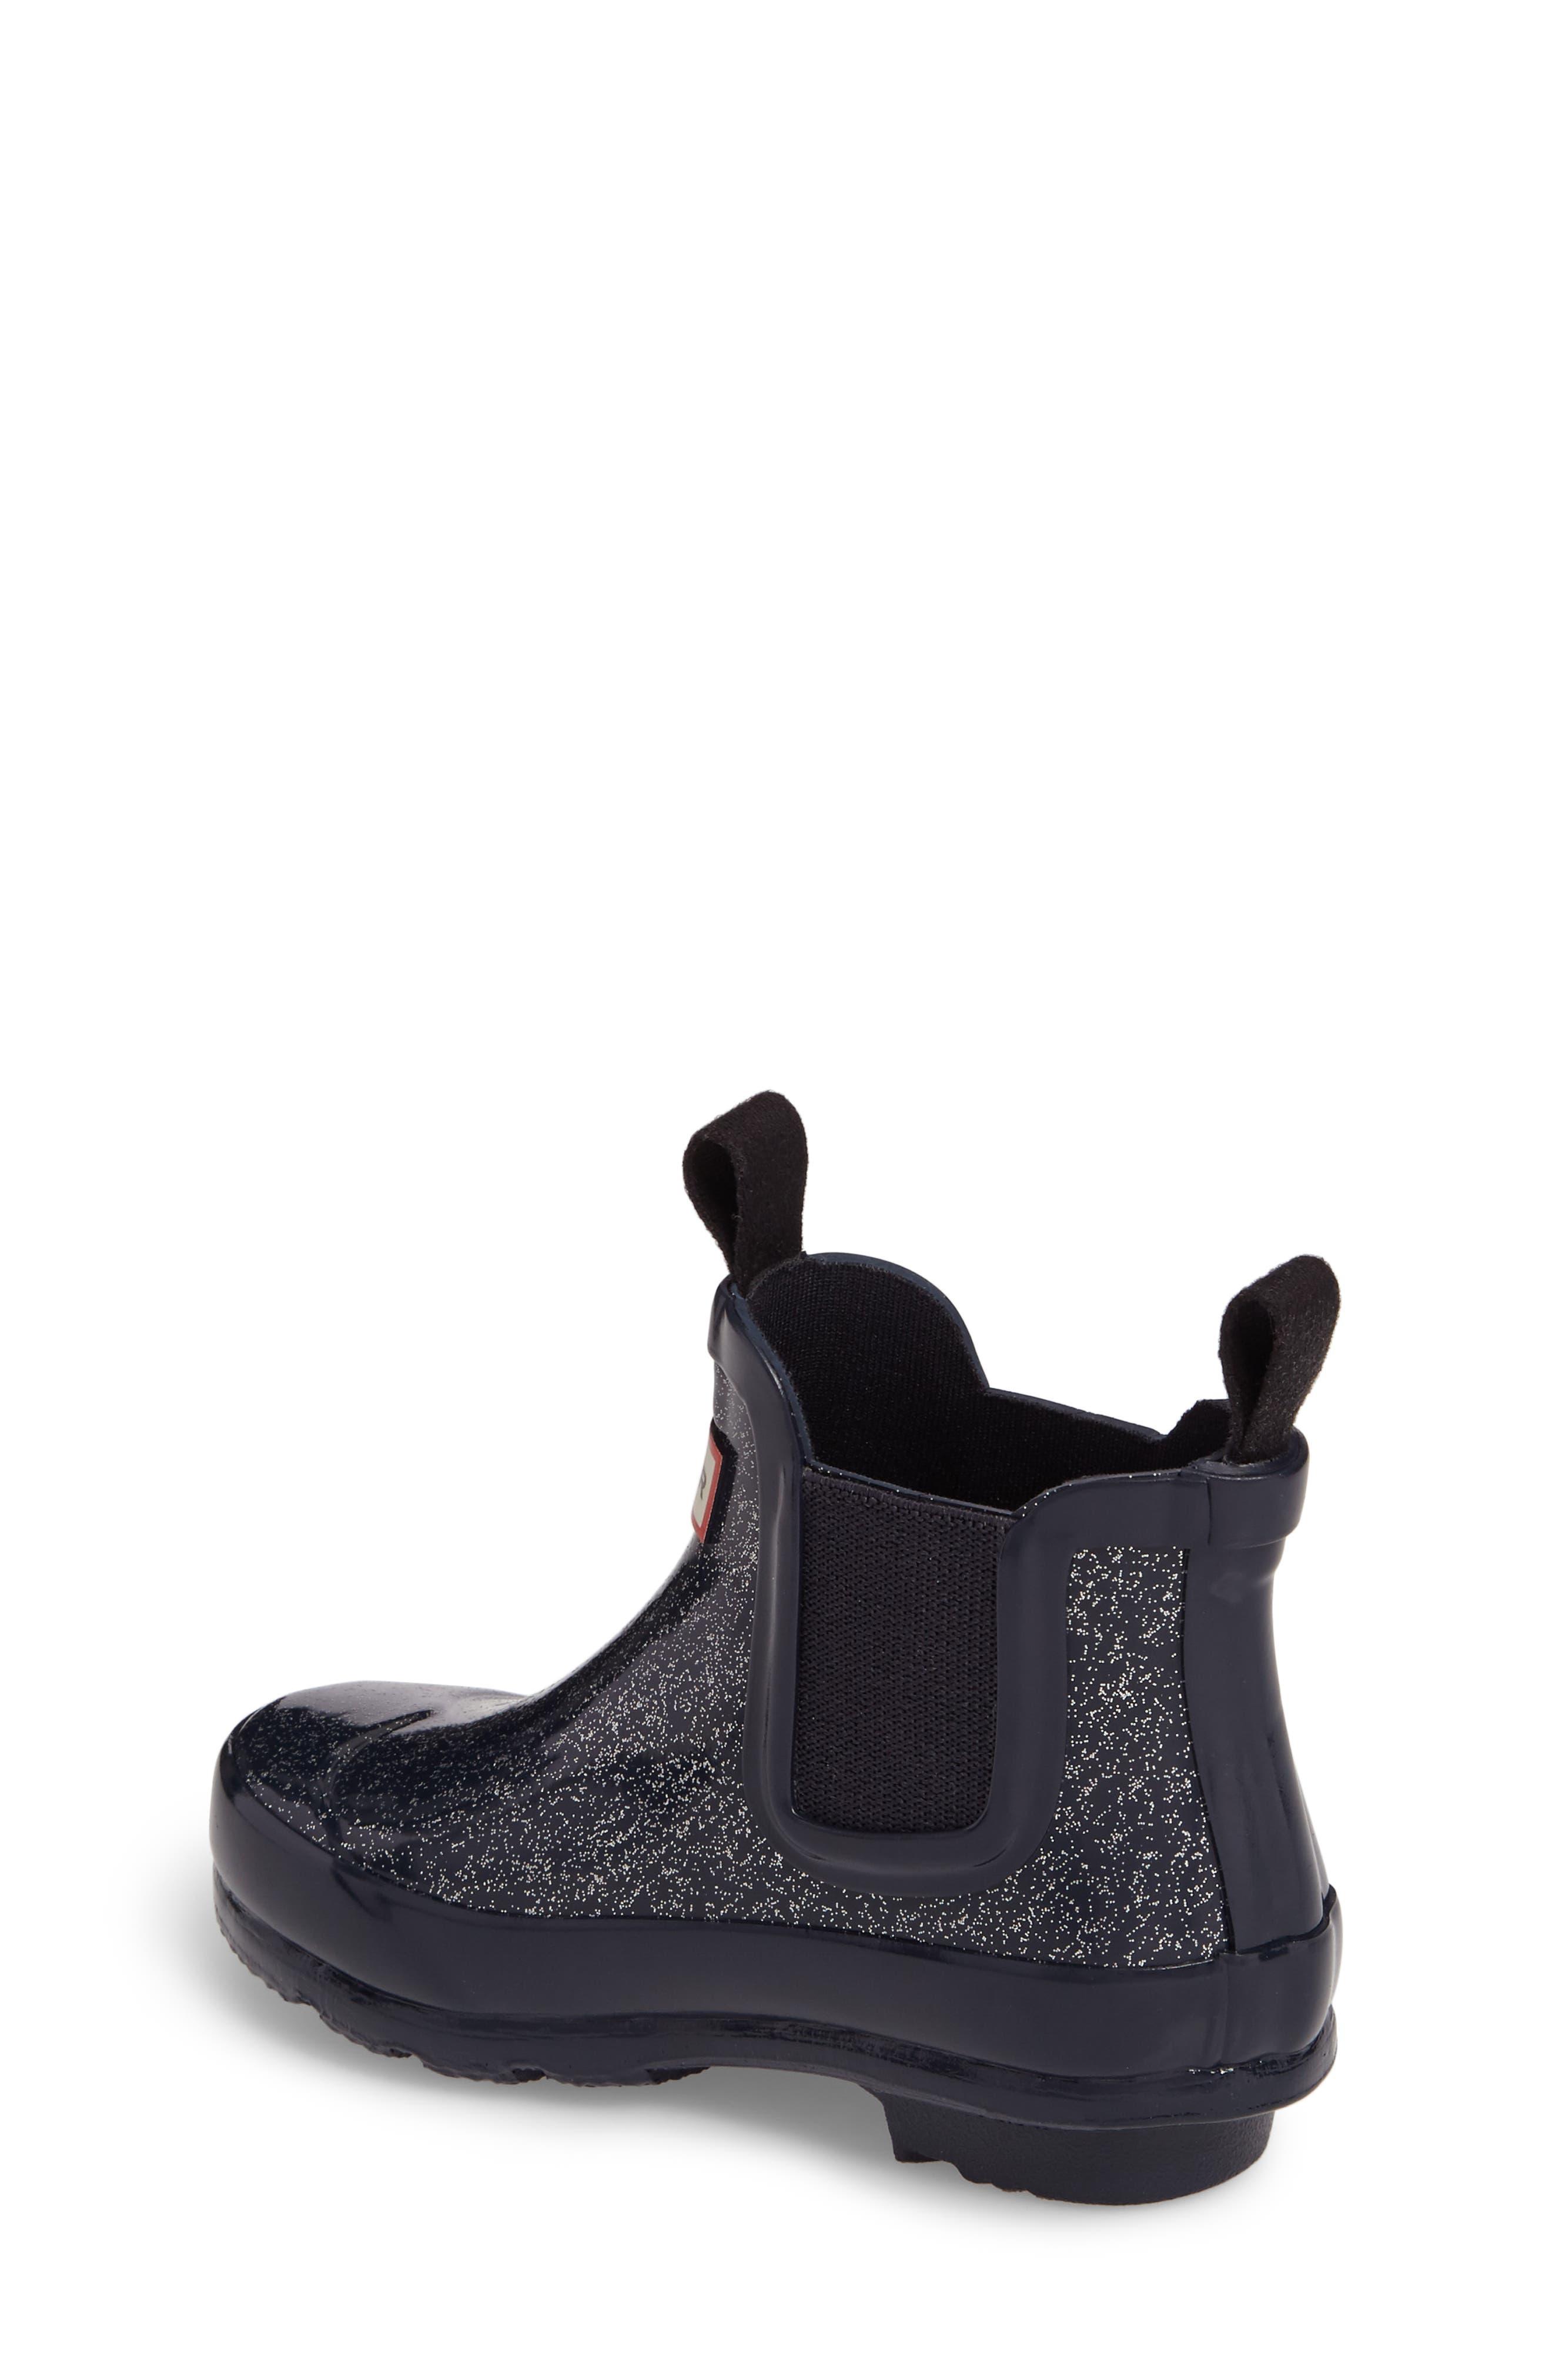 Alternate Image 2  - Hunter Originals Glittery Waterproof Chelsea Boot (Toddler)